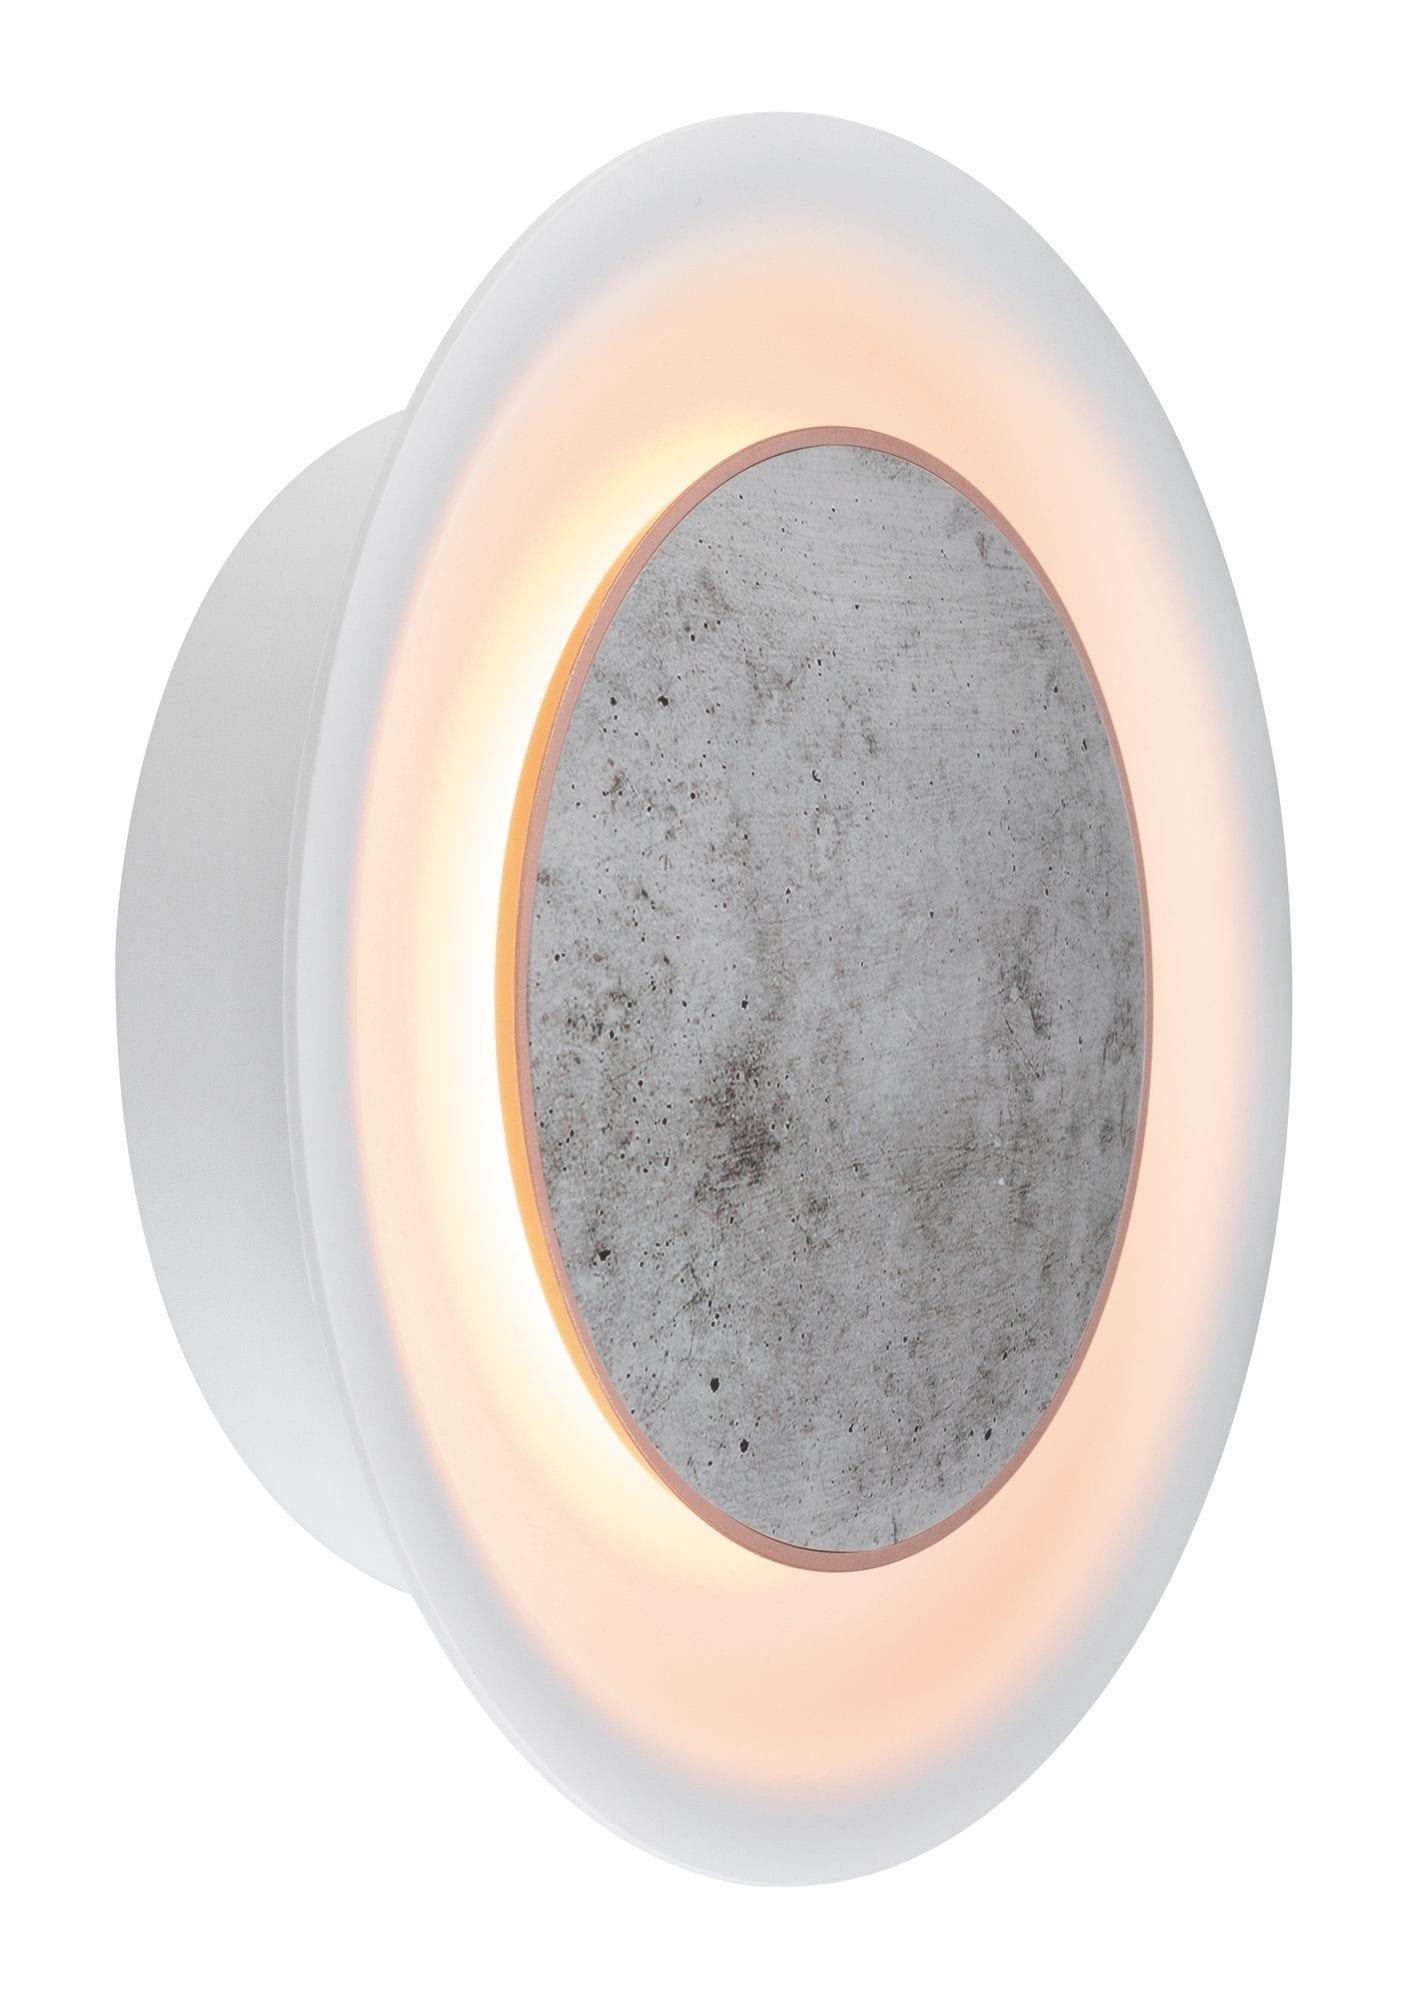 Paulmann LED Wandleuchte Neordic Wandleuchte Tiril 6,3W Betonoptik Weiß matt/Grau/Kupfer, 1 St., Warmweiß